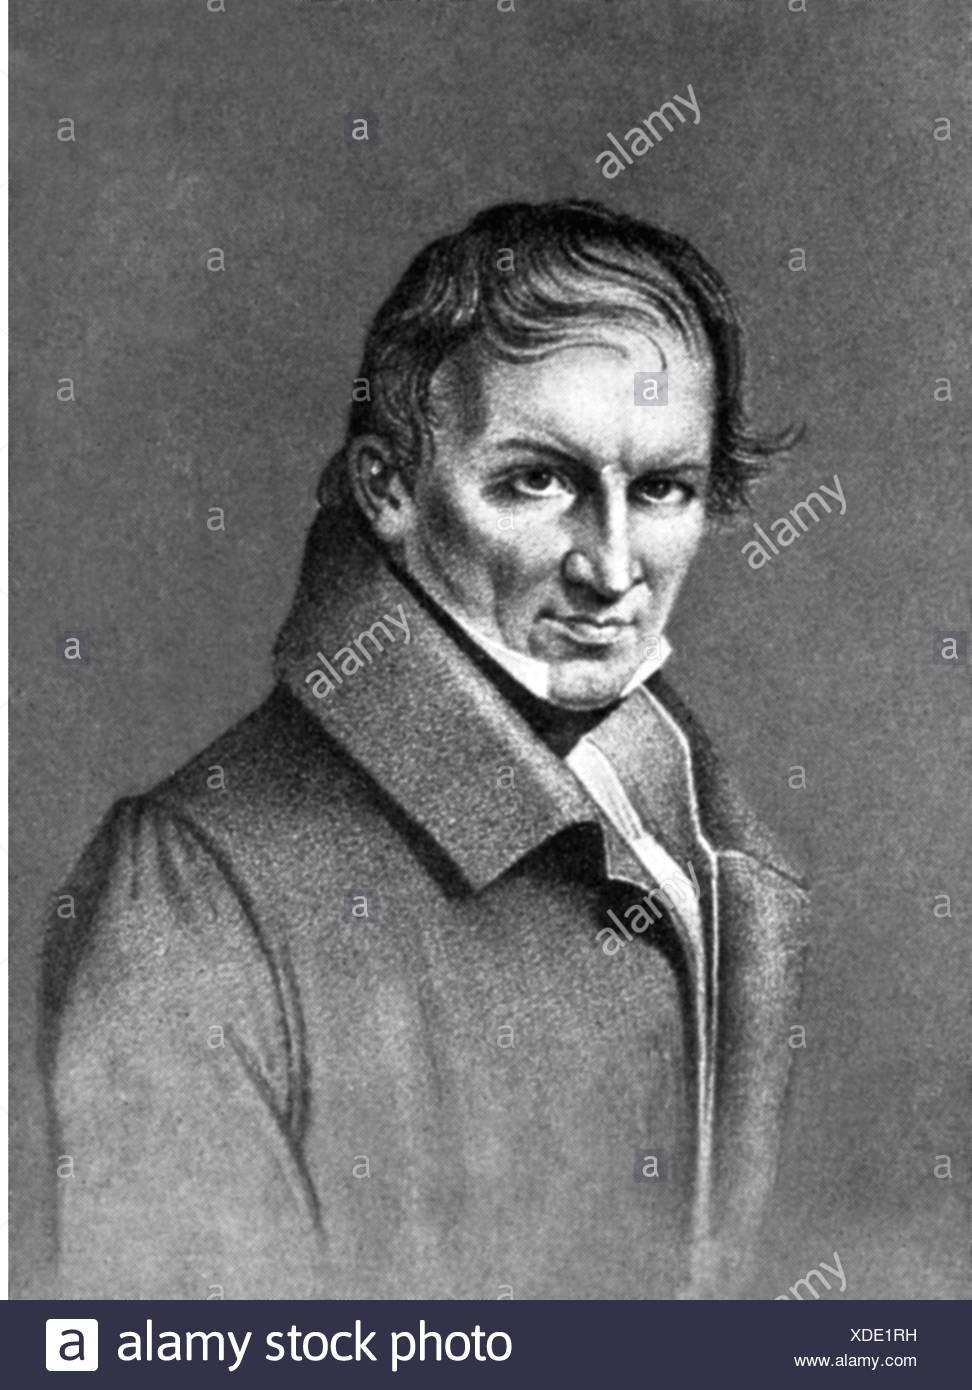 Tieck, Christian Friedrich, 14.8.1776 - 24.5.1851, German sculptor, portrait, lithograph by Johann Sprick after drawing by Stockbild